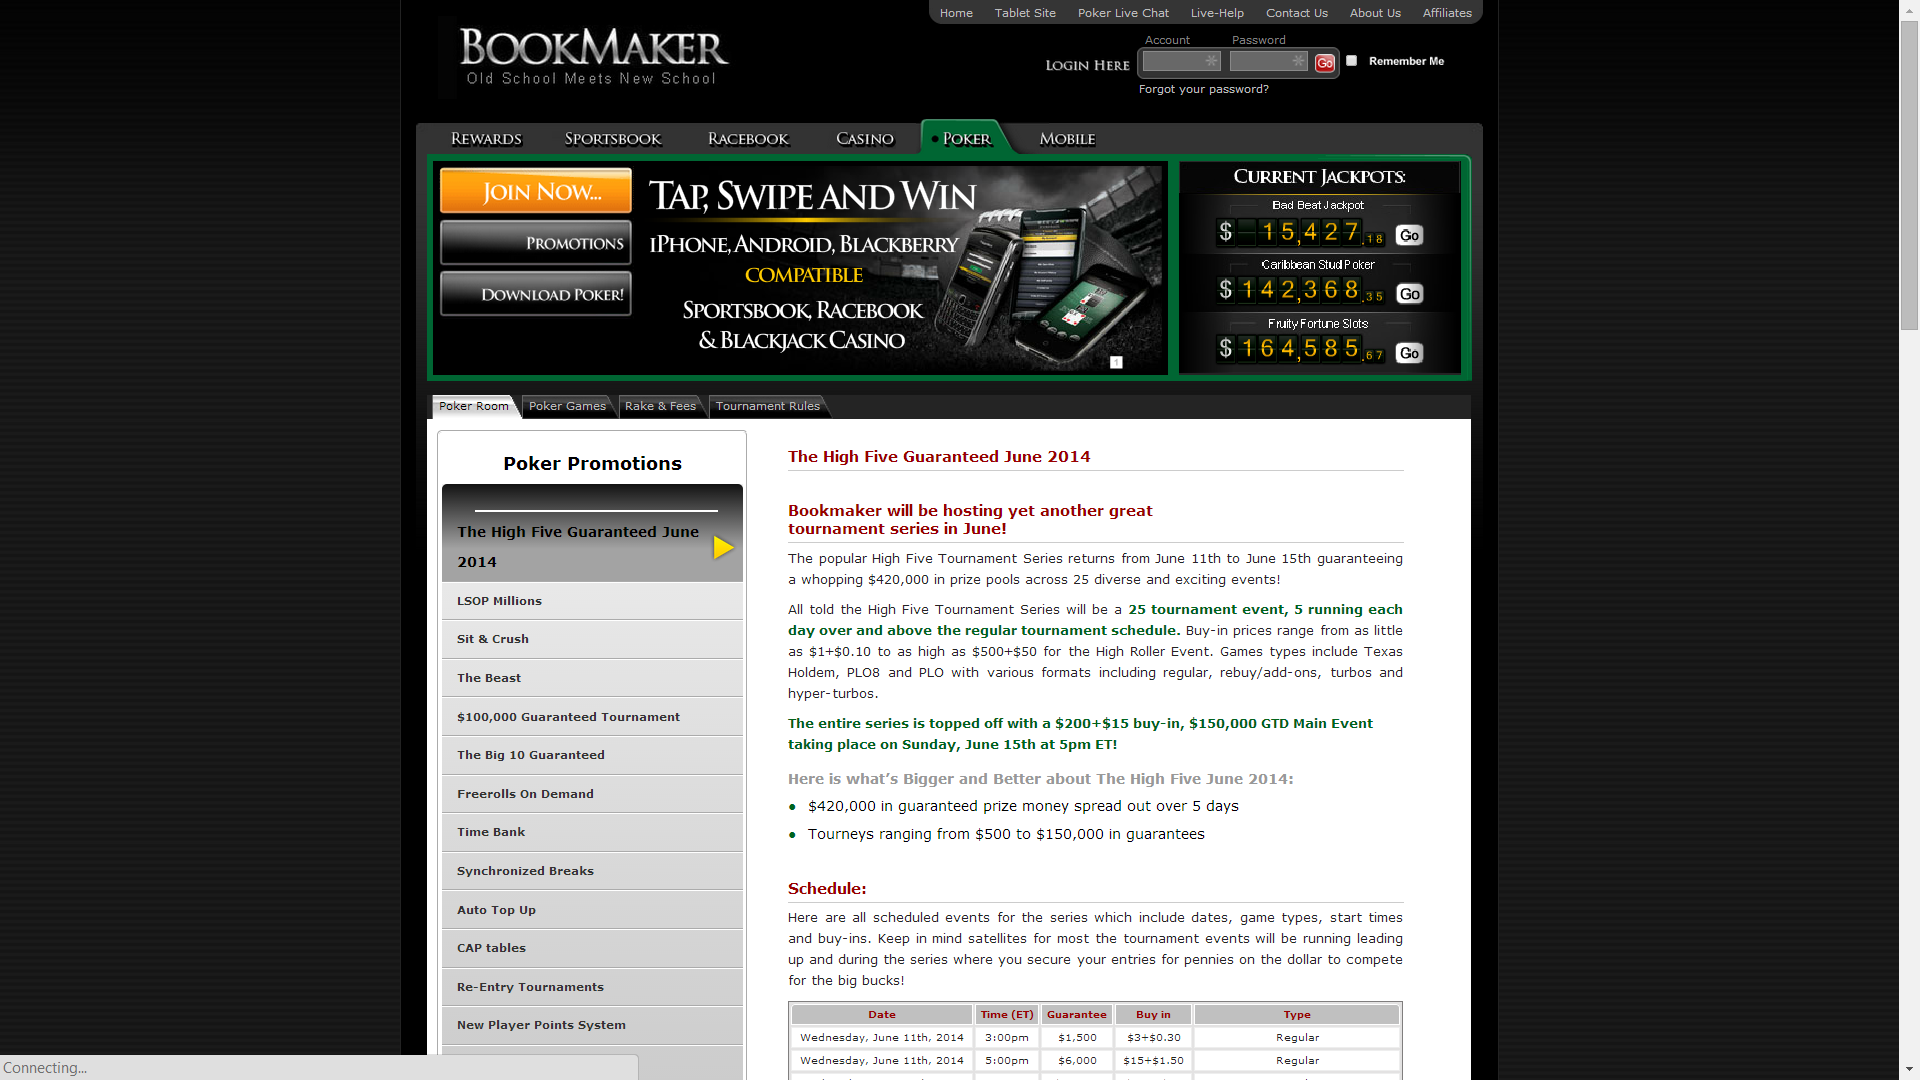 sportsbook com poker reviews online sportsbook sites